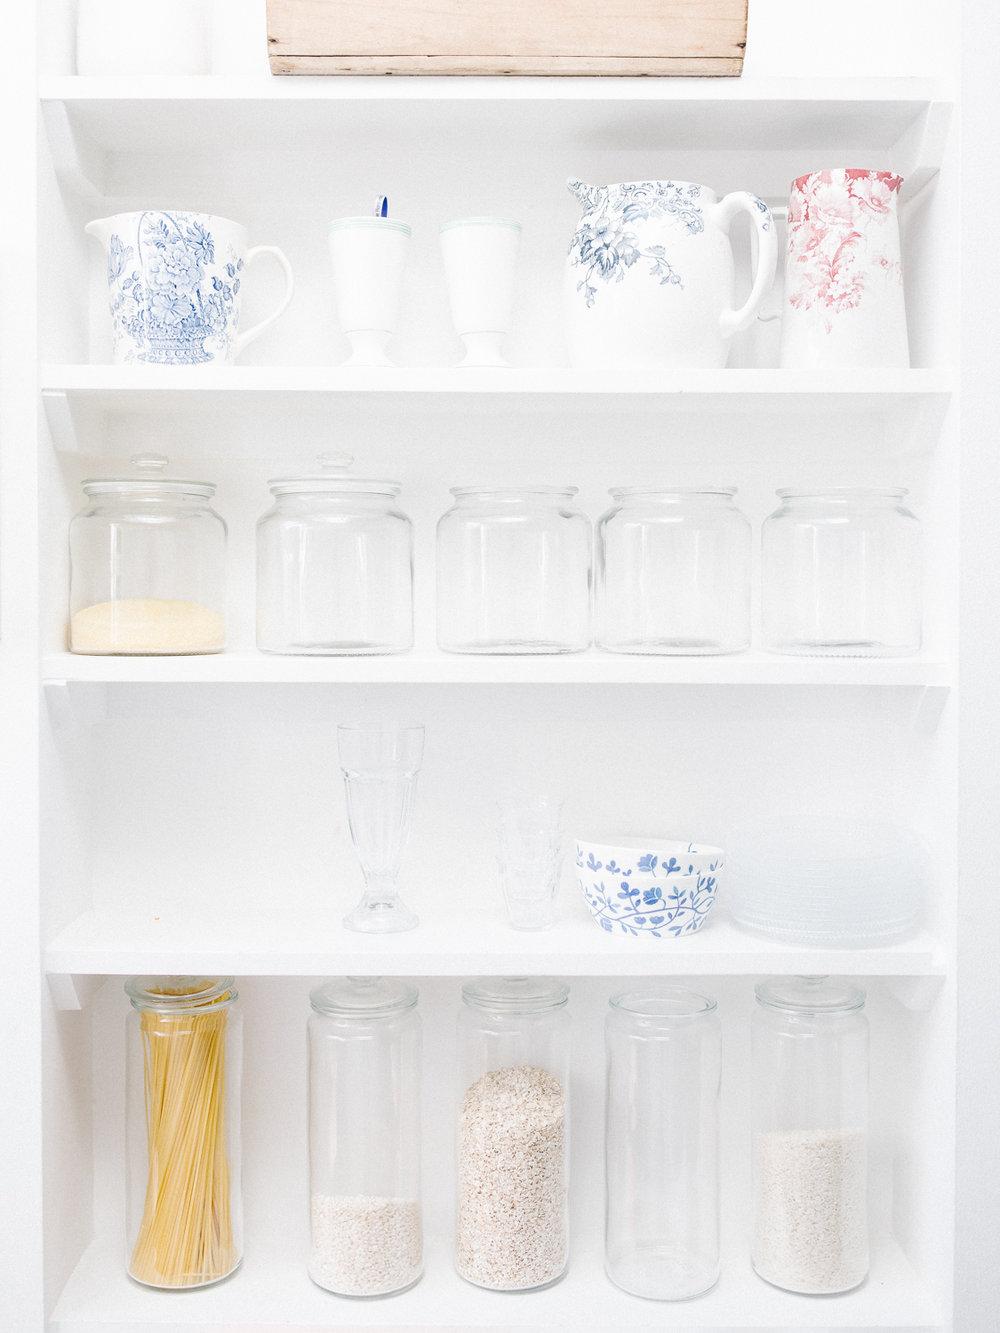 kitchen objects | Larkhall Place, Bath